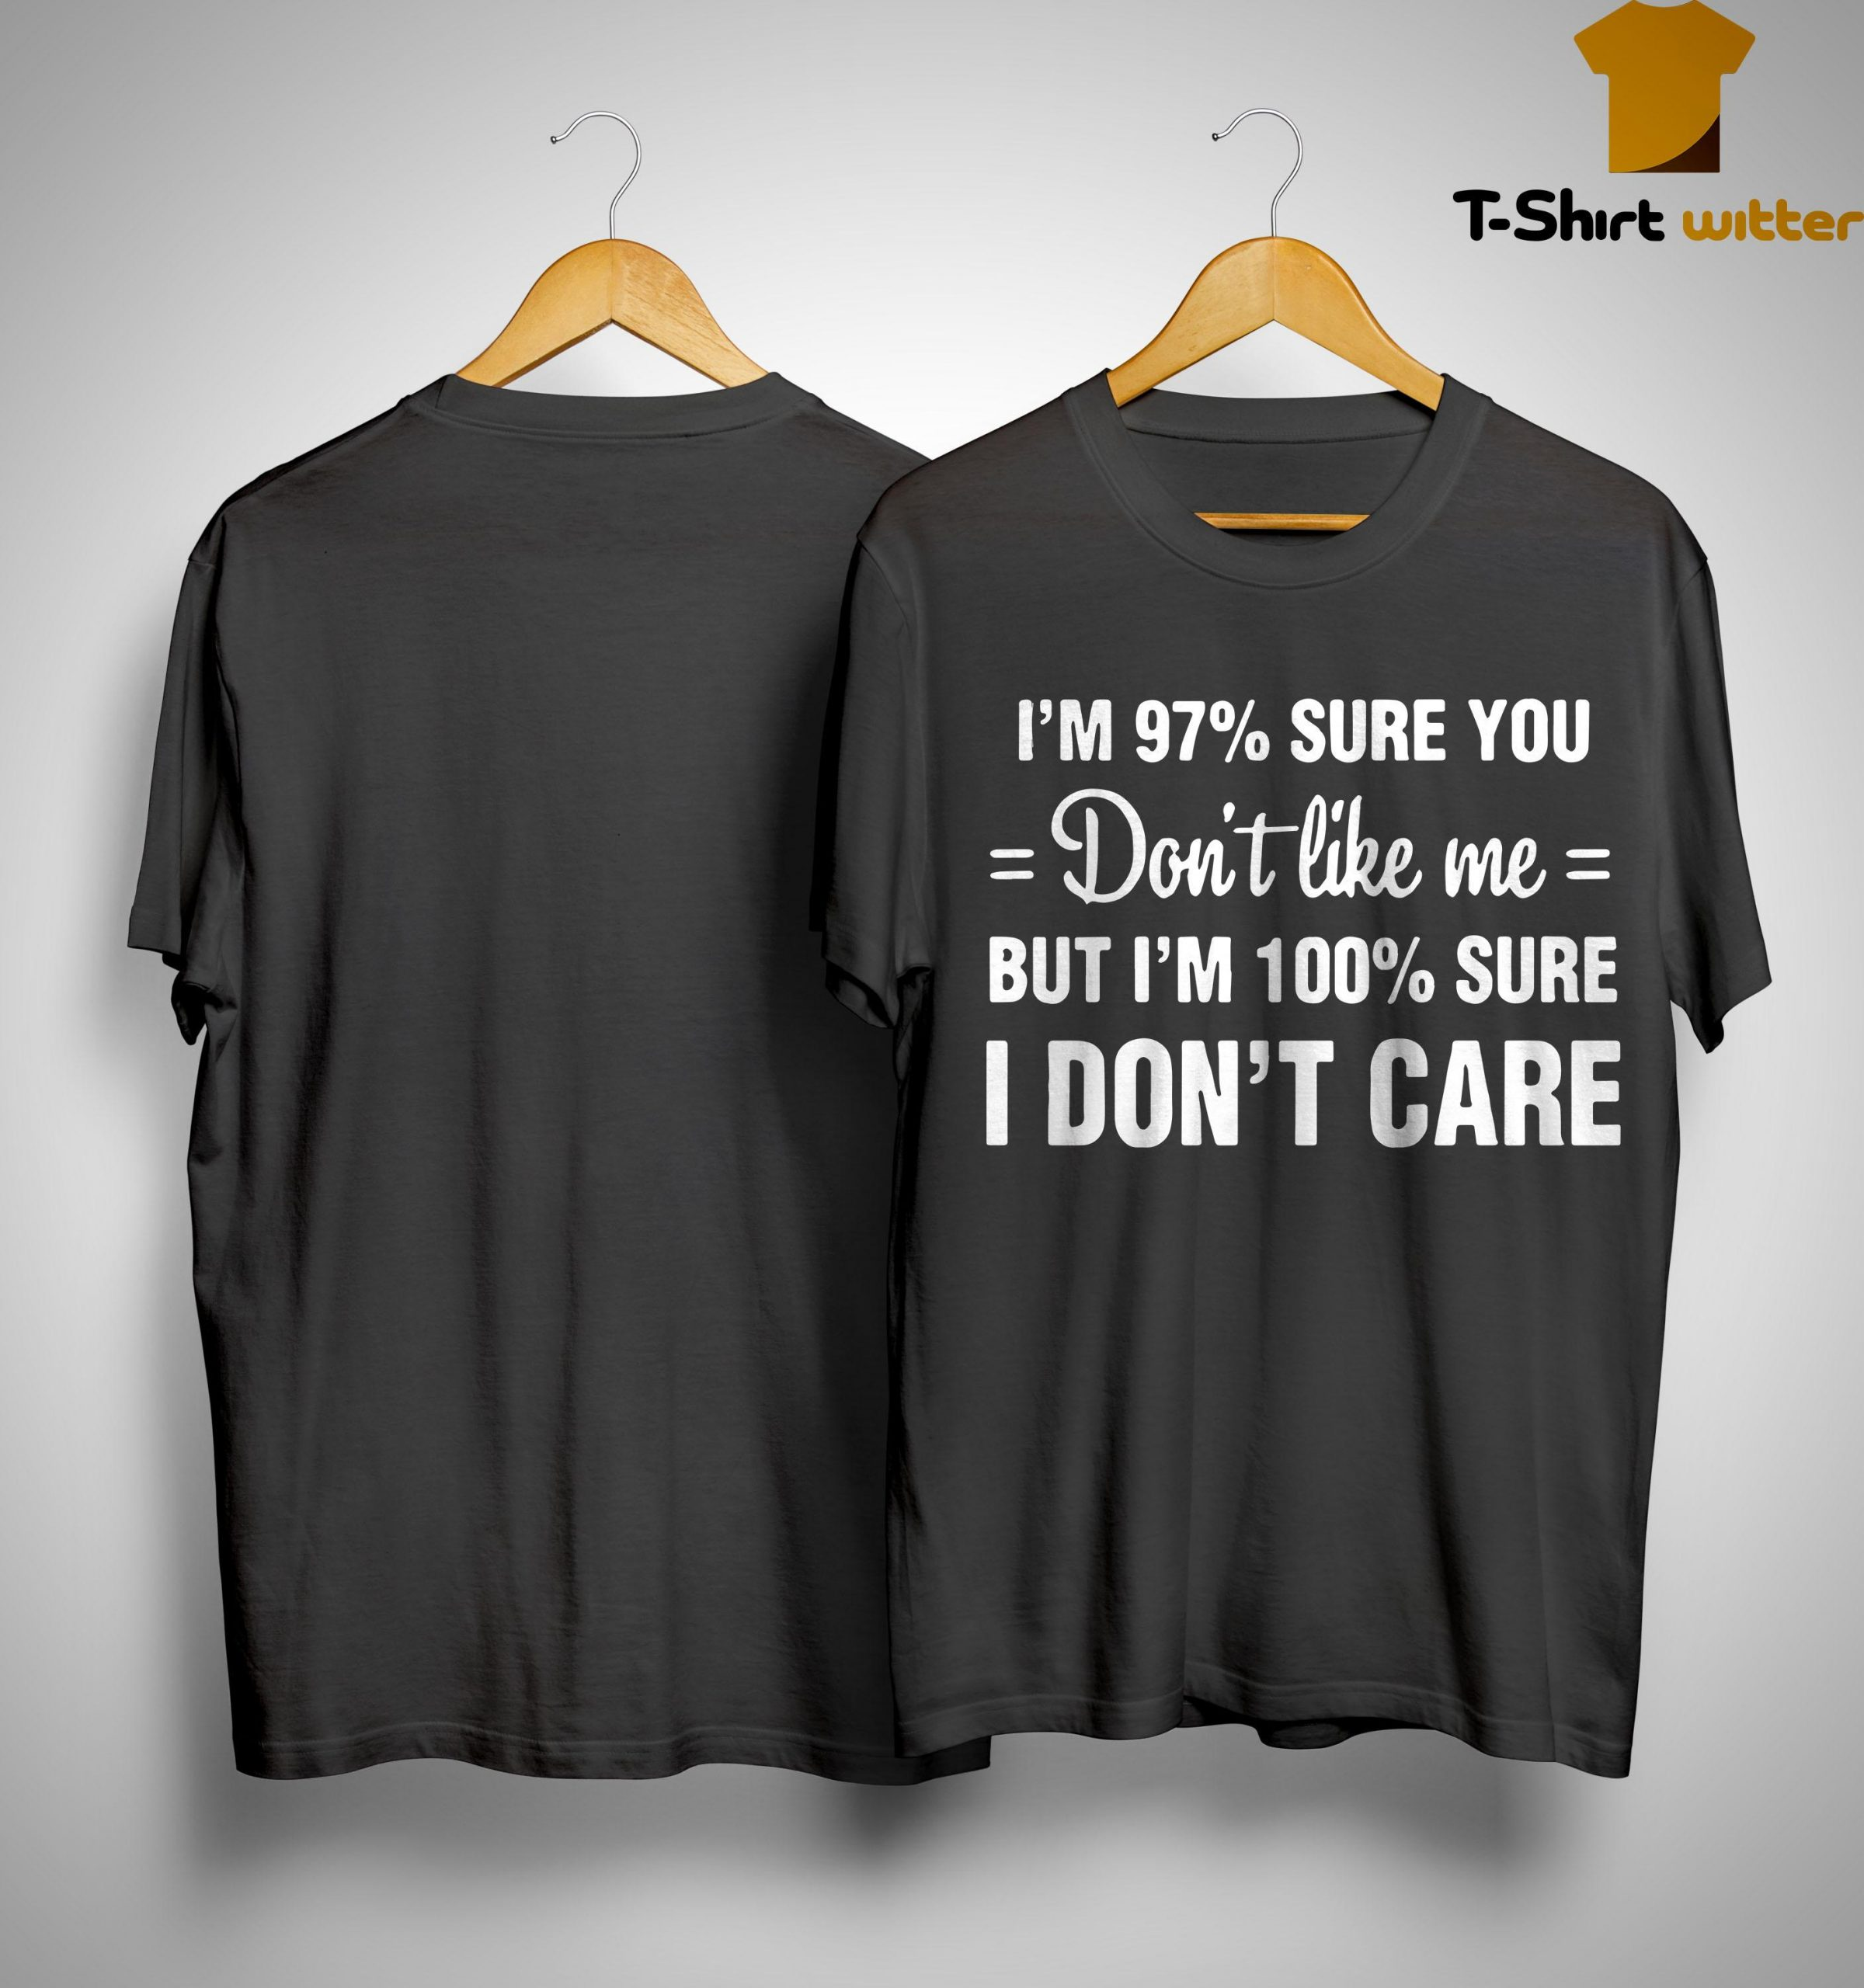 I'm 97% Sure You Don't Like Me But I'm 100% Sure I Don't Care Shirt